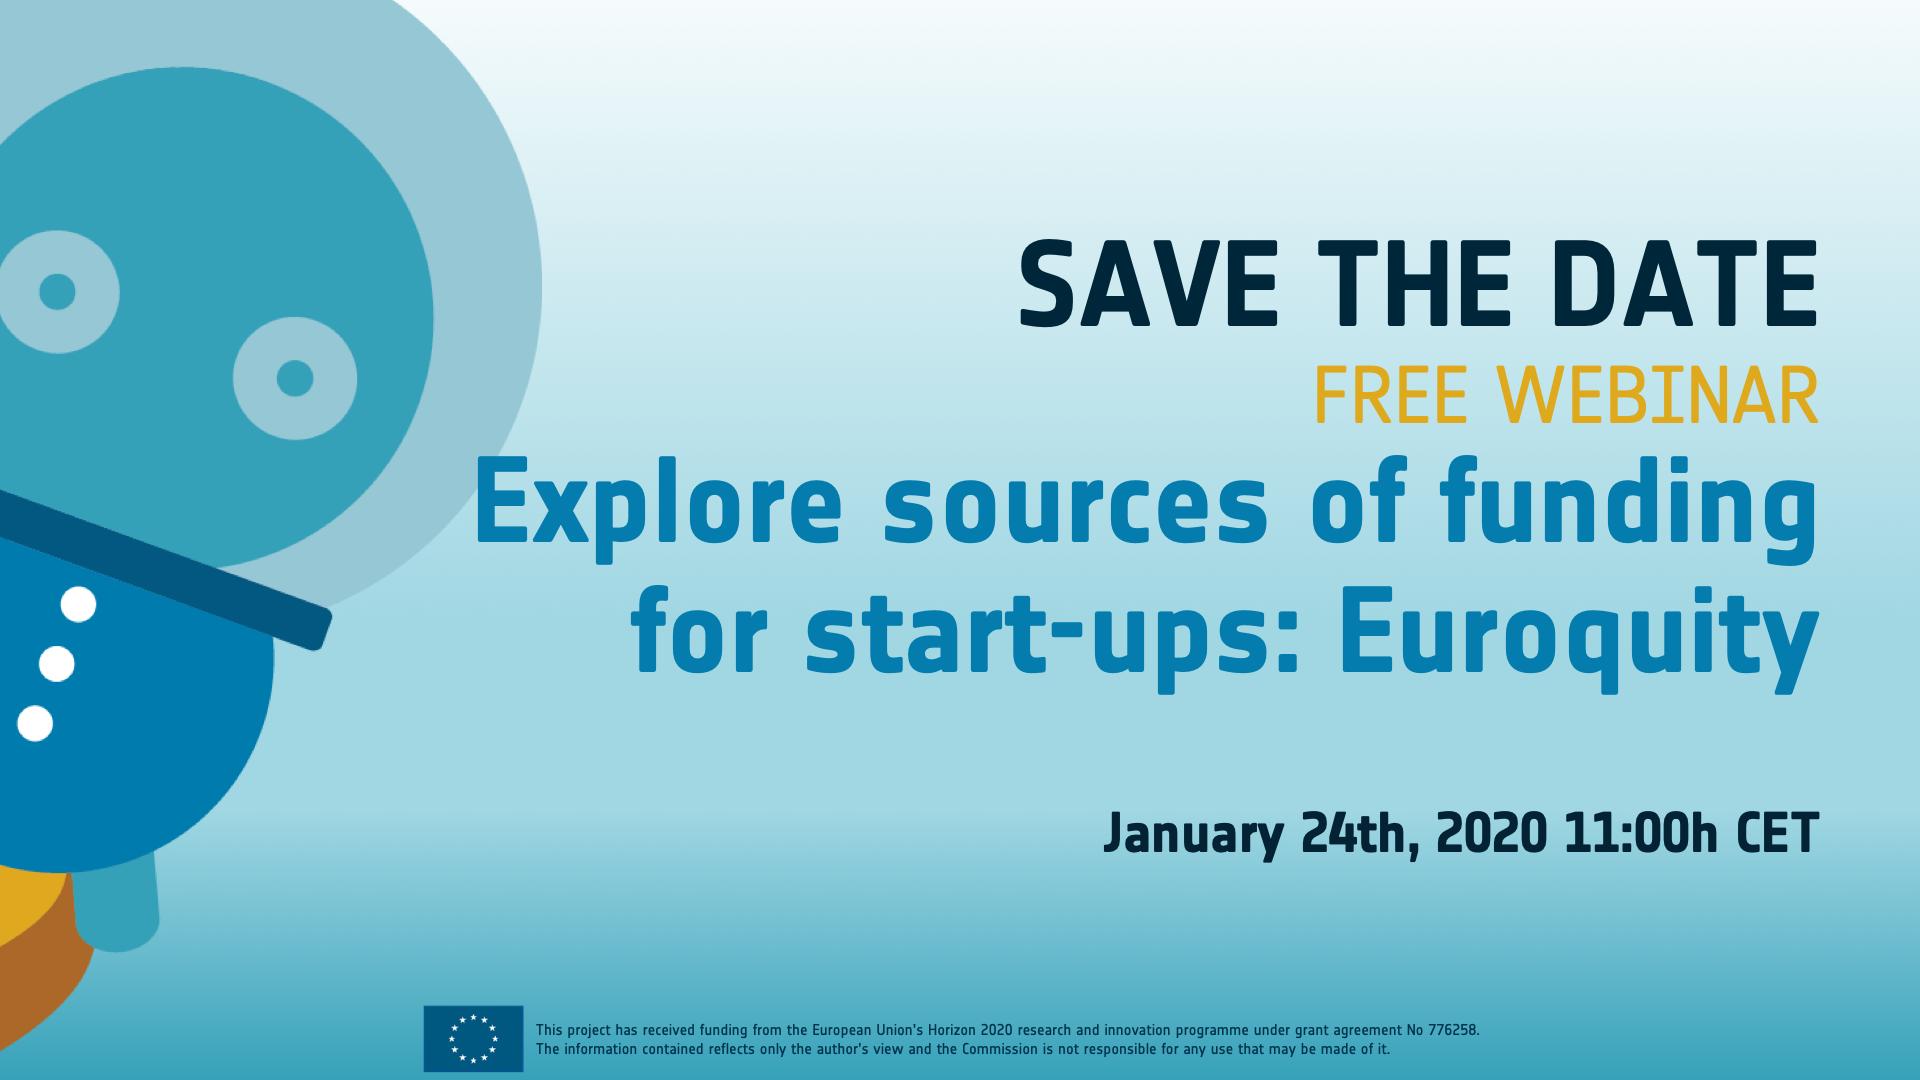 Webinar: Explore sources of funding for start-ups: Euroquity